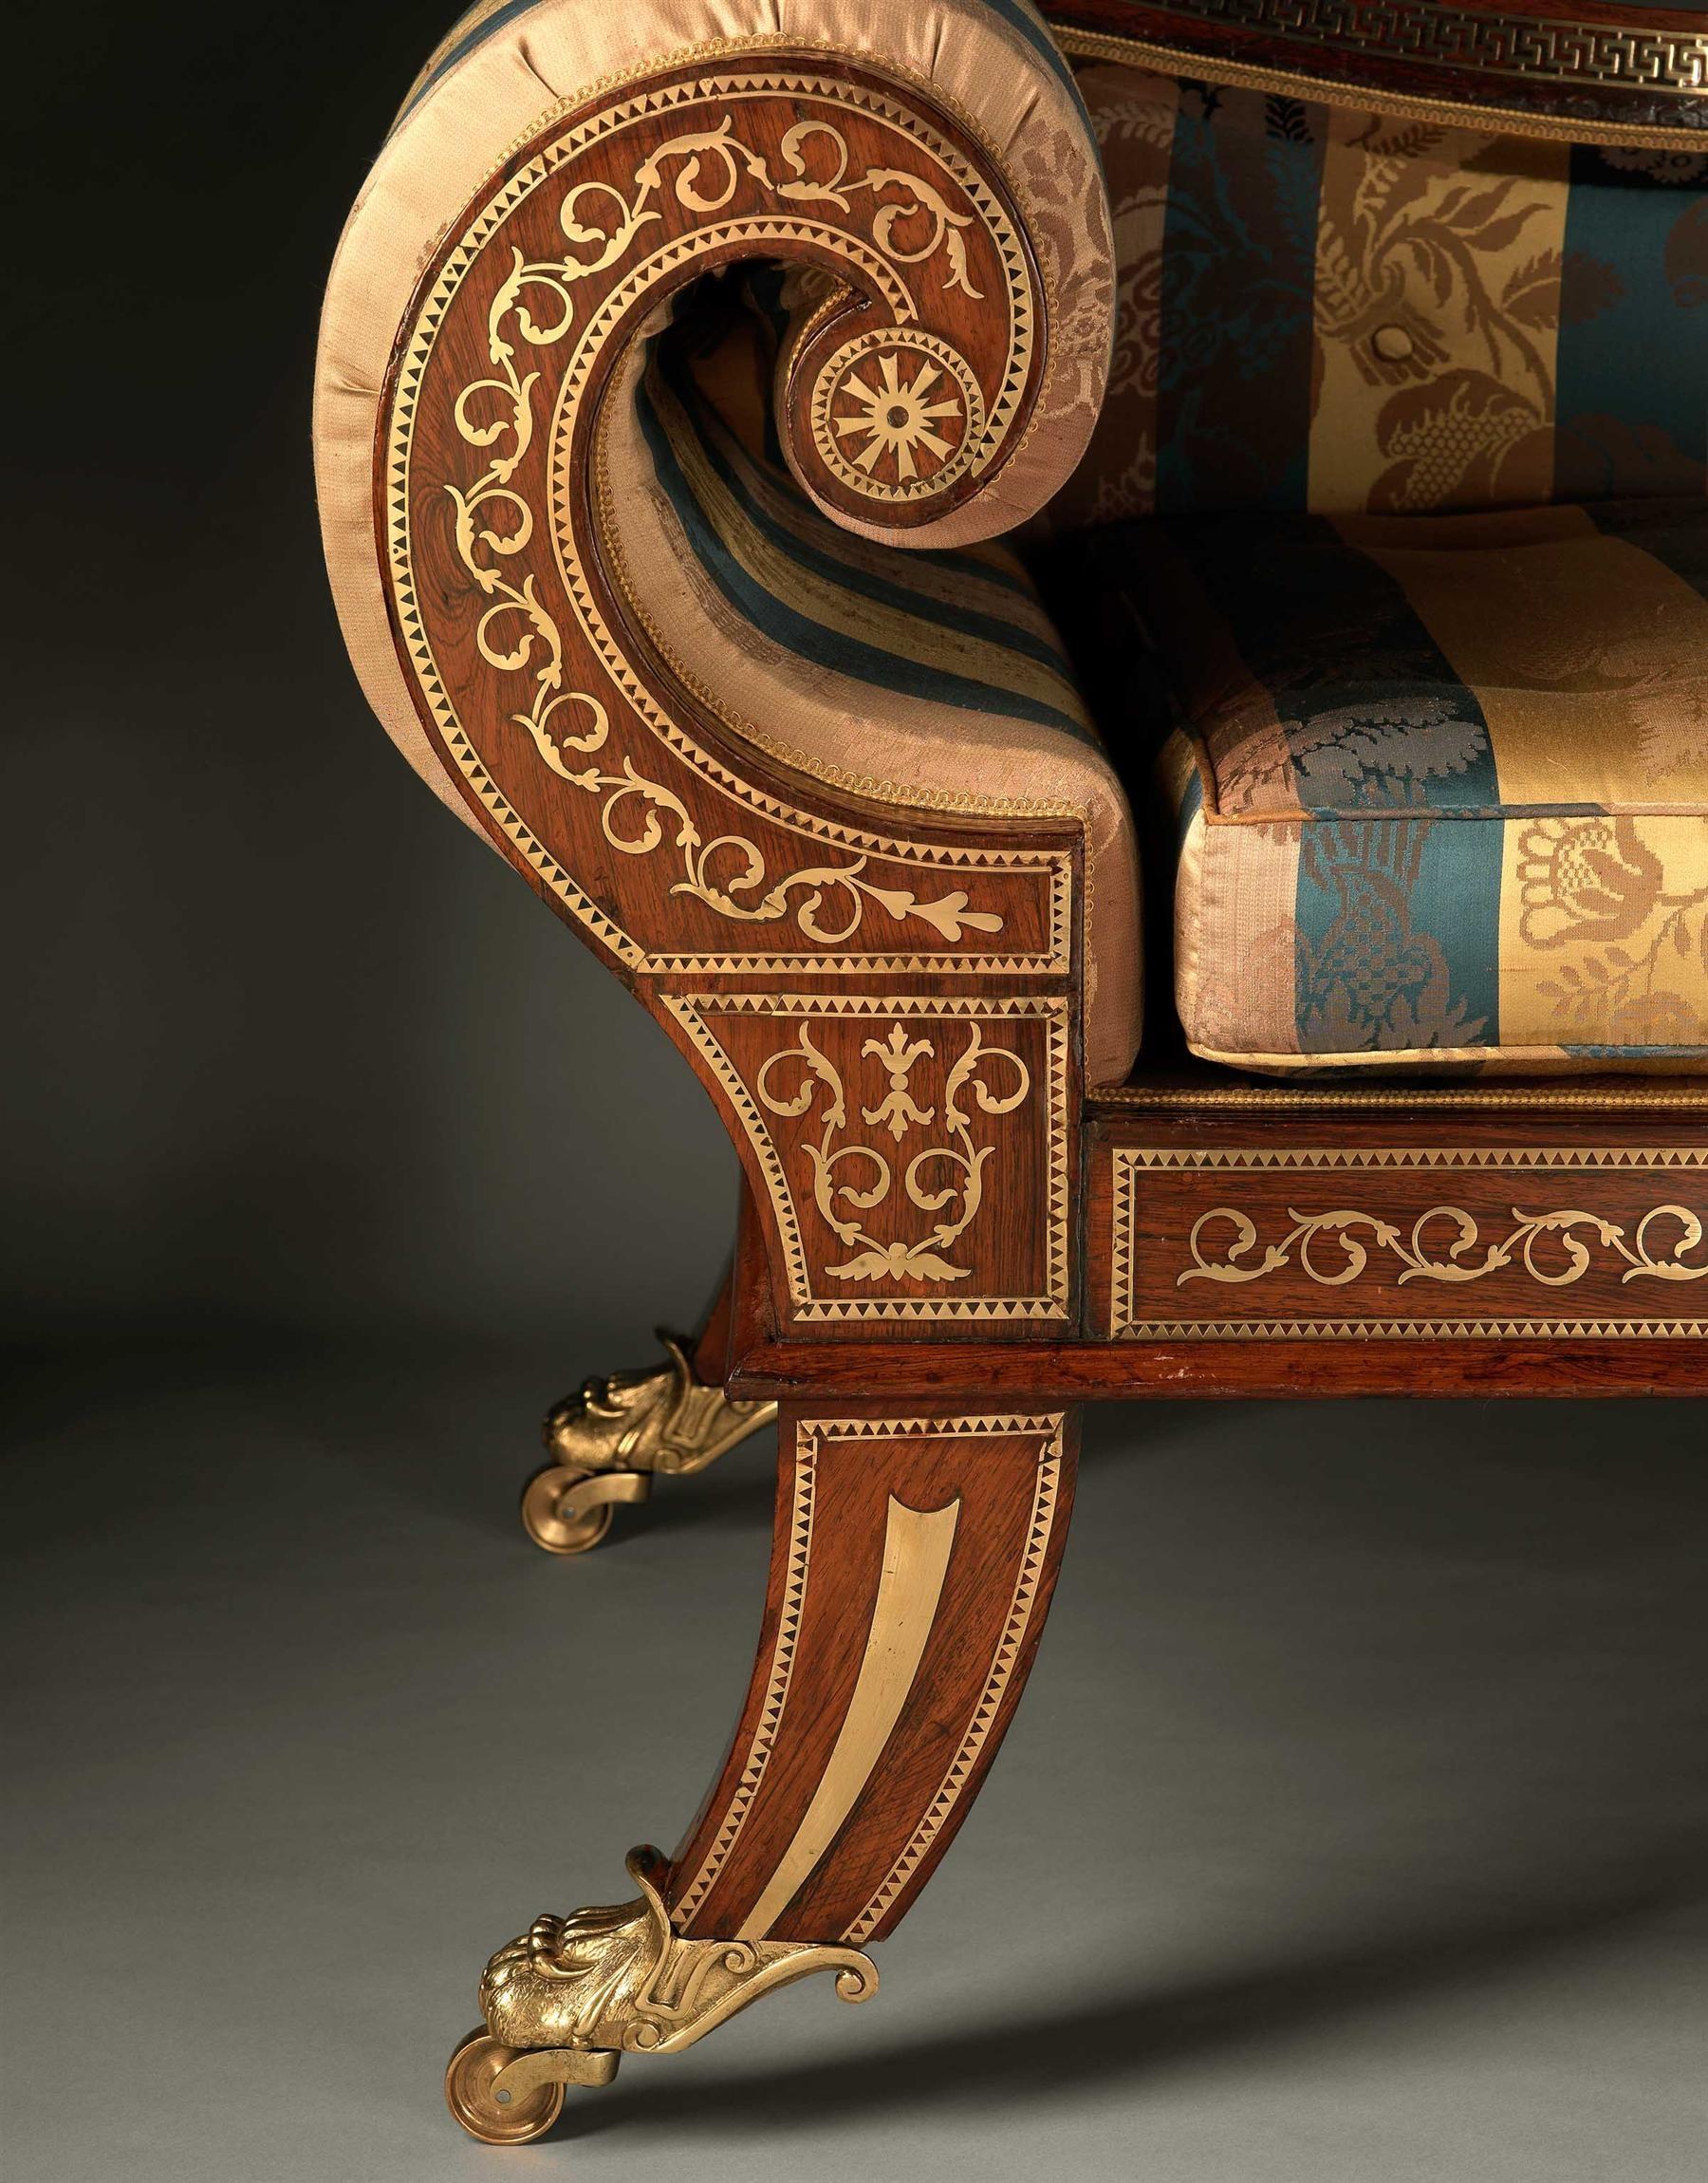 A Regency Rosewood Chaise Longue Circa 1810 Oturma Odasi Fikirleri Ic Tasarim Dekor